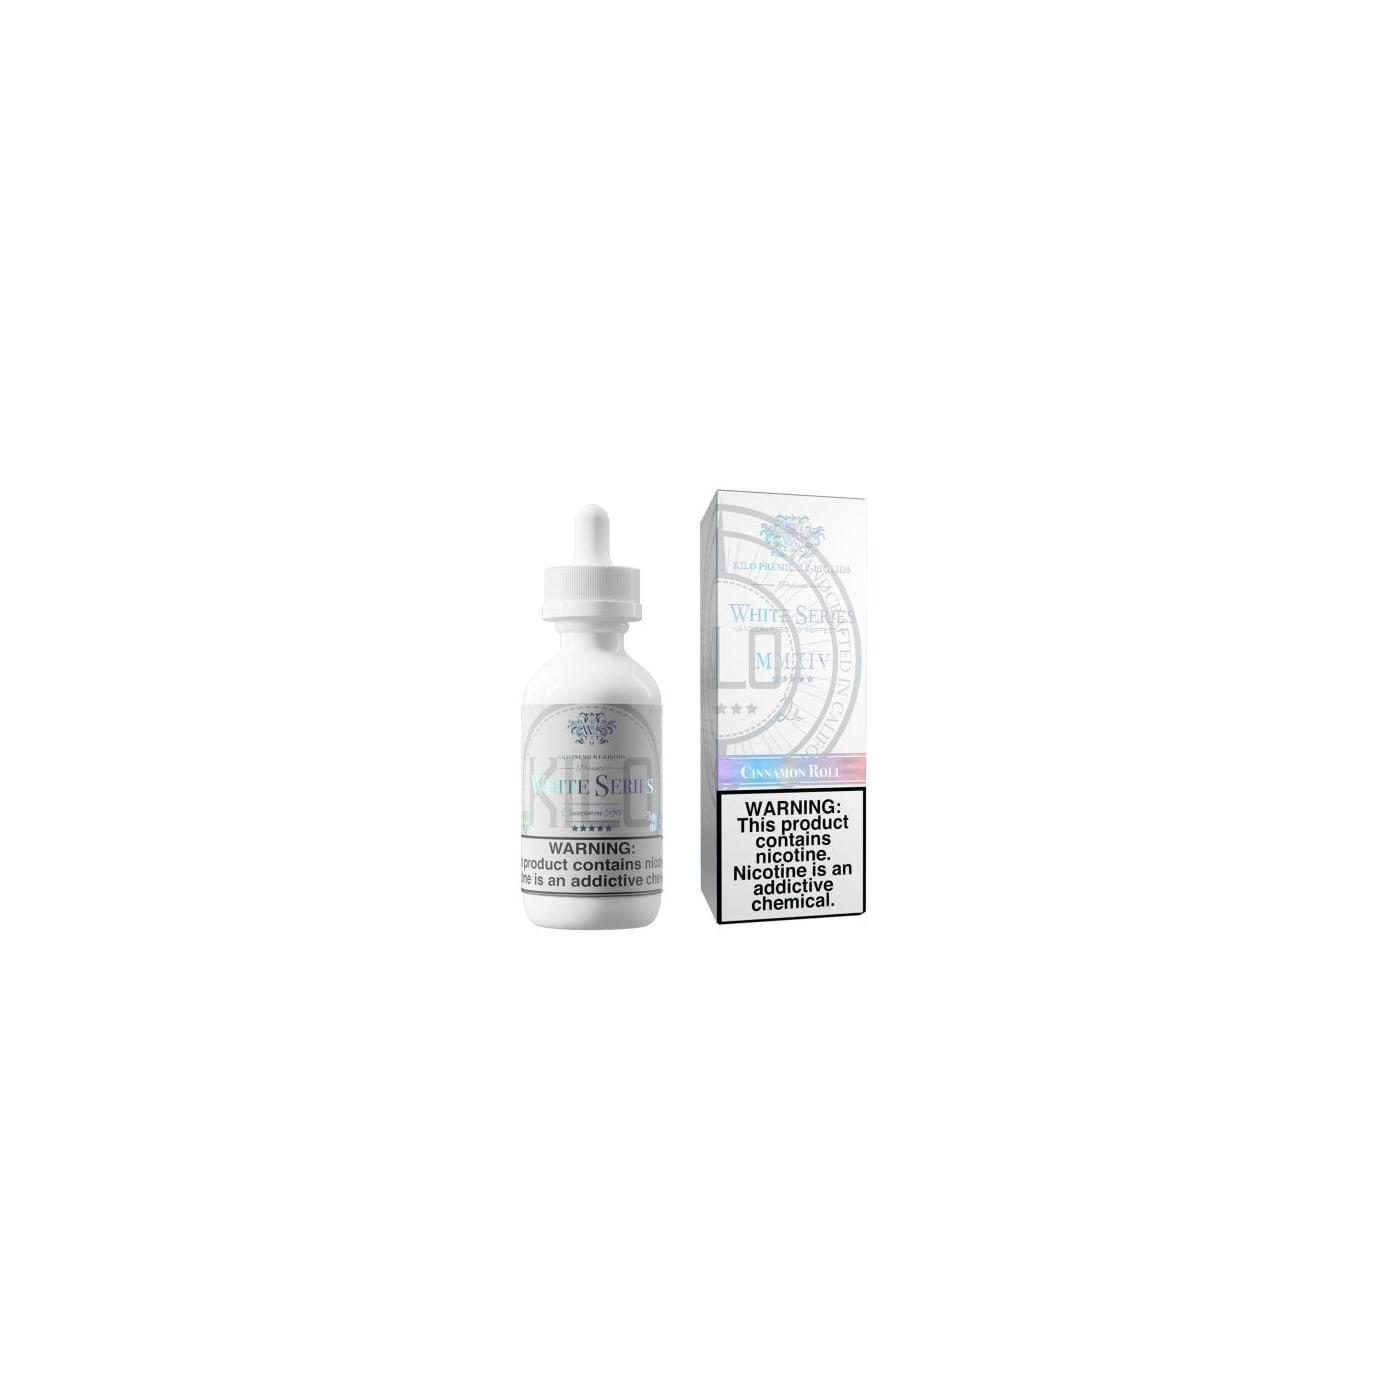 Cinnamon Roll 60ml E-Juice - Kilo White Series Vape Liquid